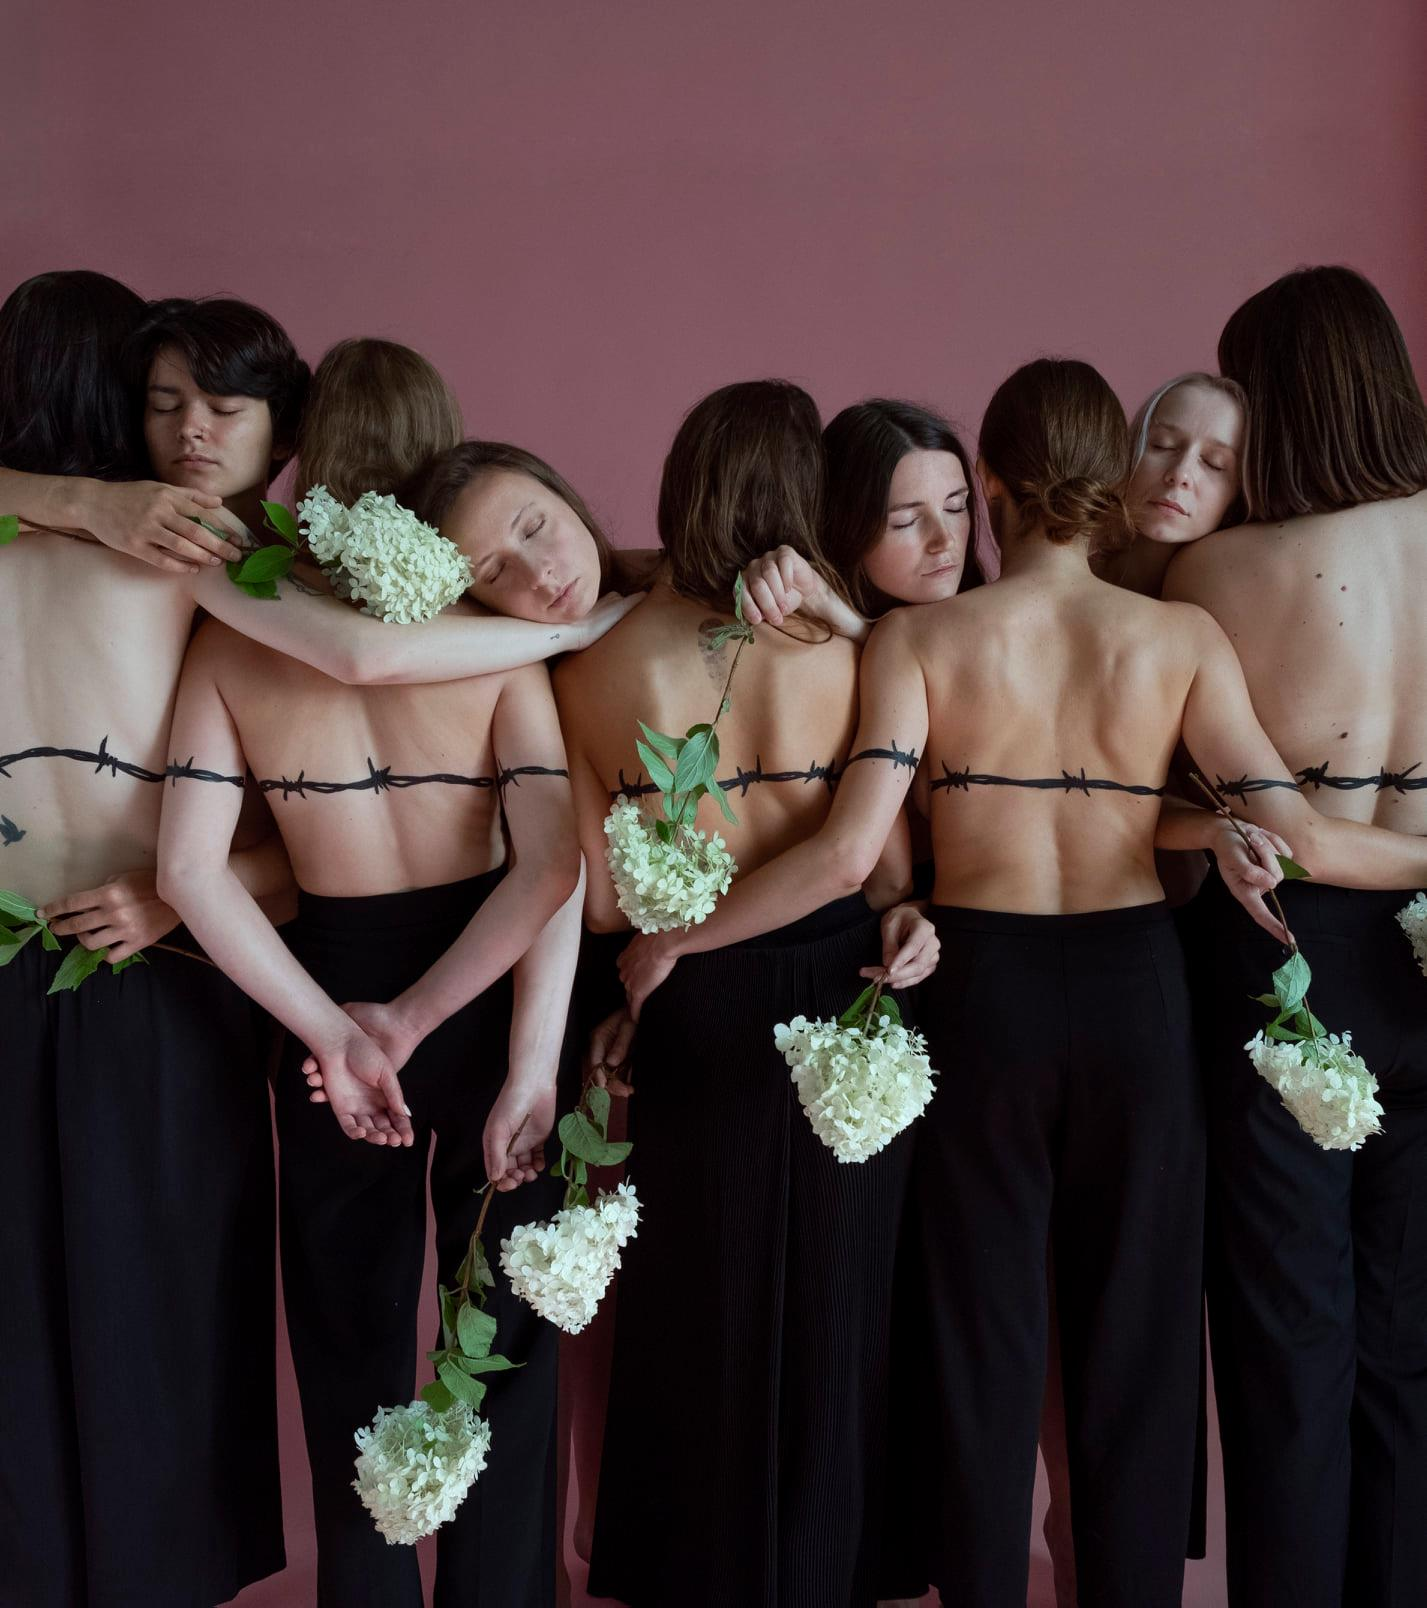 Моц, каханне, свабода - Евы Беларусi 🌺. Ph&Idea: Anna Kosobutskayaю ShotArt: Nadya Sayapina. Location: Фотостудия Ind